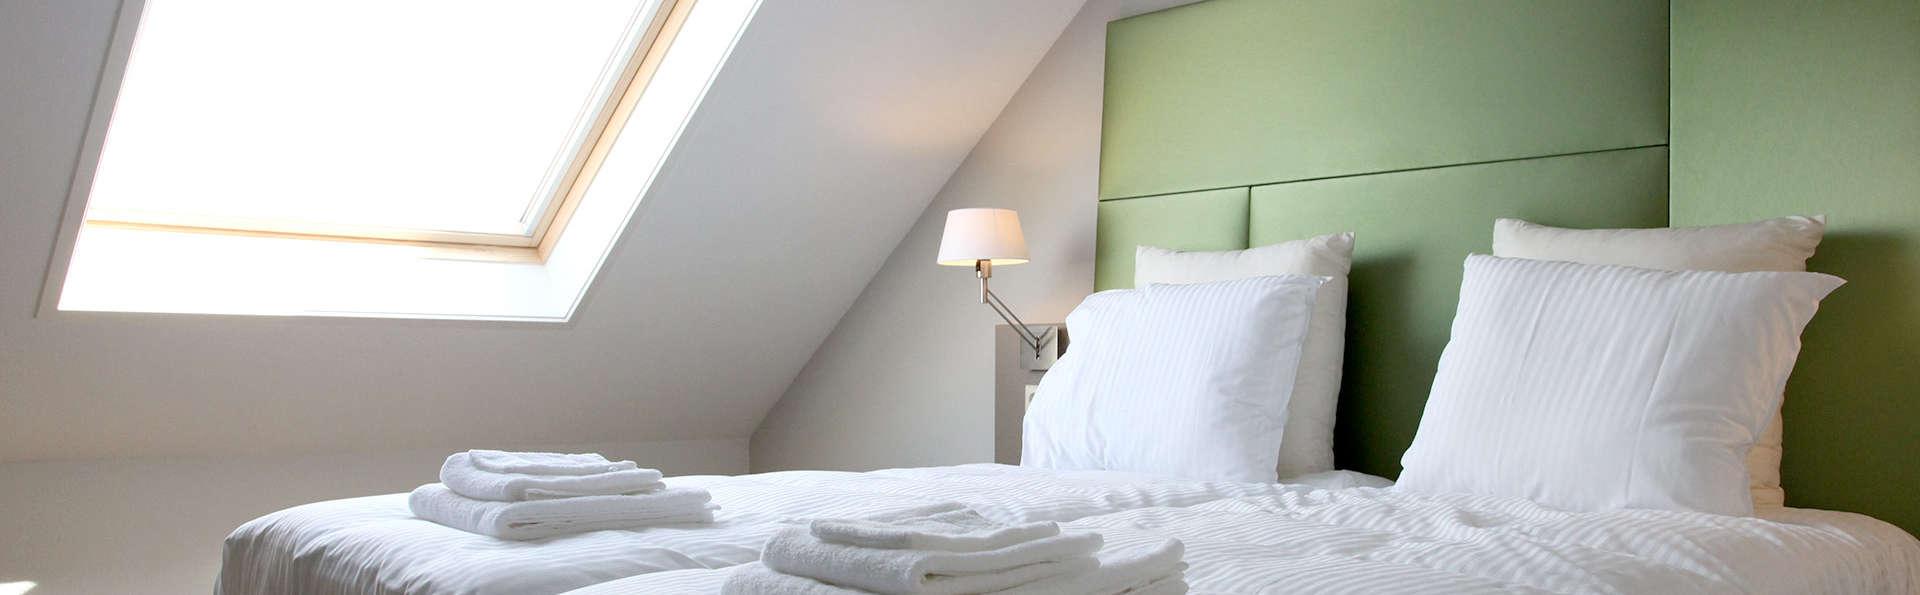 Art & Wellness Hotel Huis ten Wolde - Edit_Room5.jpg